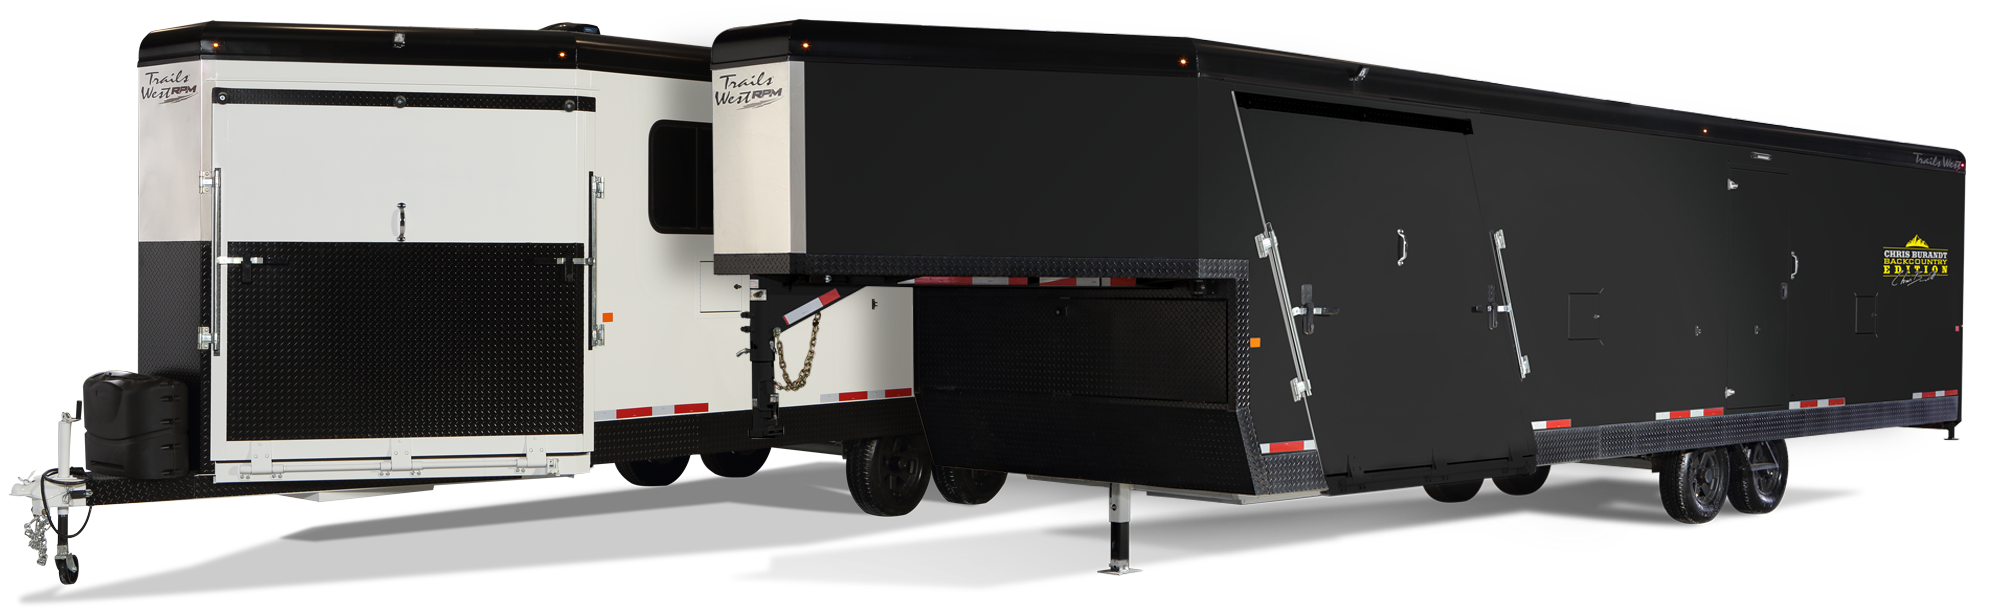 Enclosed Snowmobile Trailers - Gooseneck & Bumper Pull